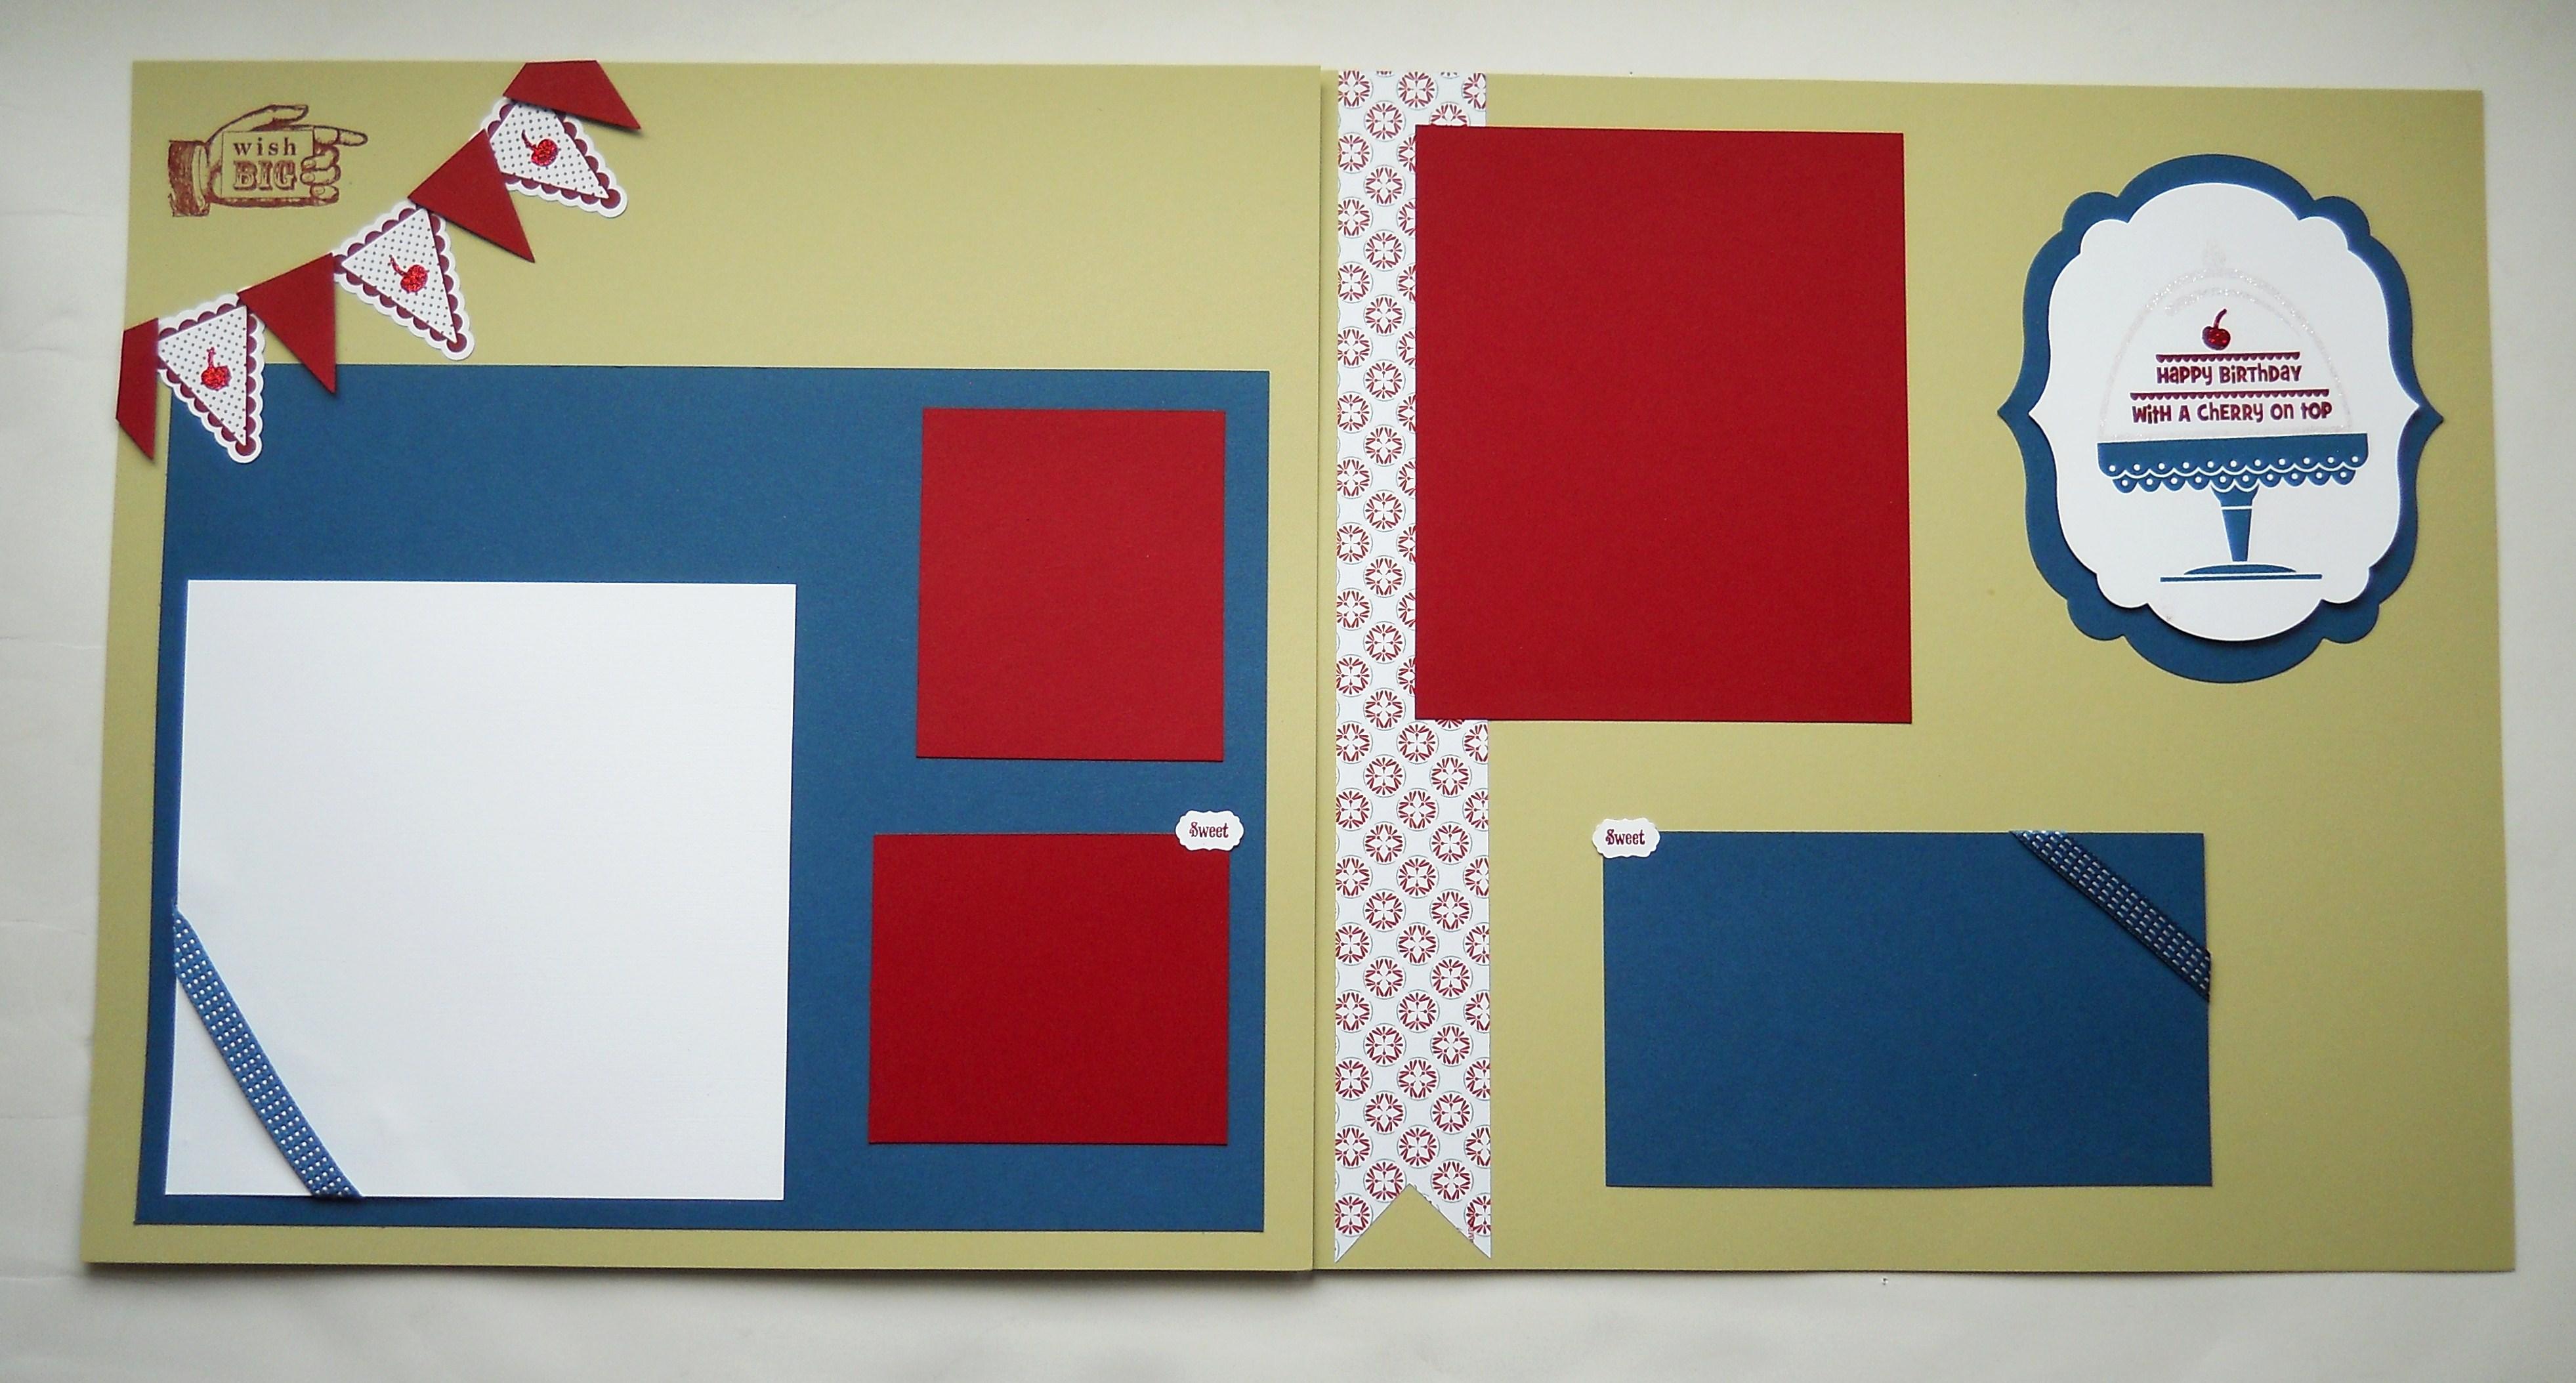 How to design scrapbook layouts - June 2012 Scrapclub Layout